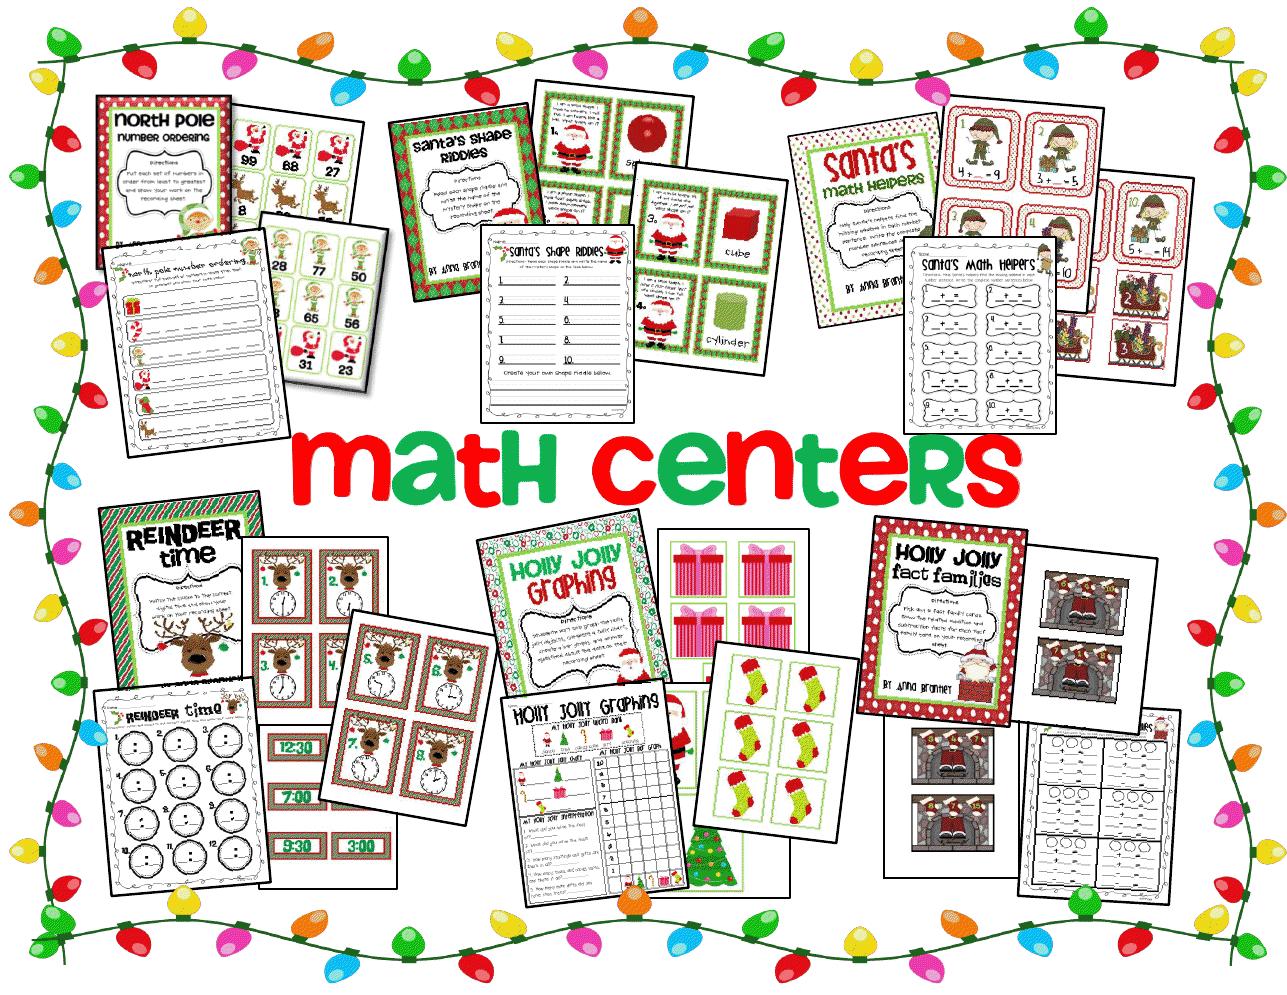 ... 995 png 323kB, Math Christmas Decorations | New Calendar Template Site